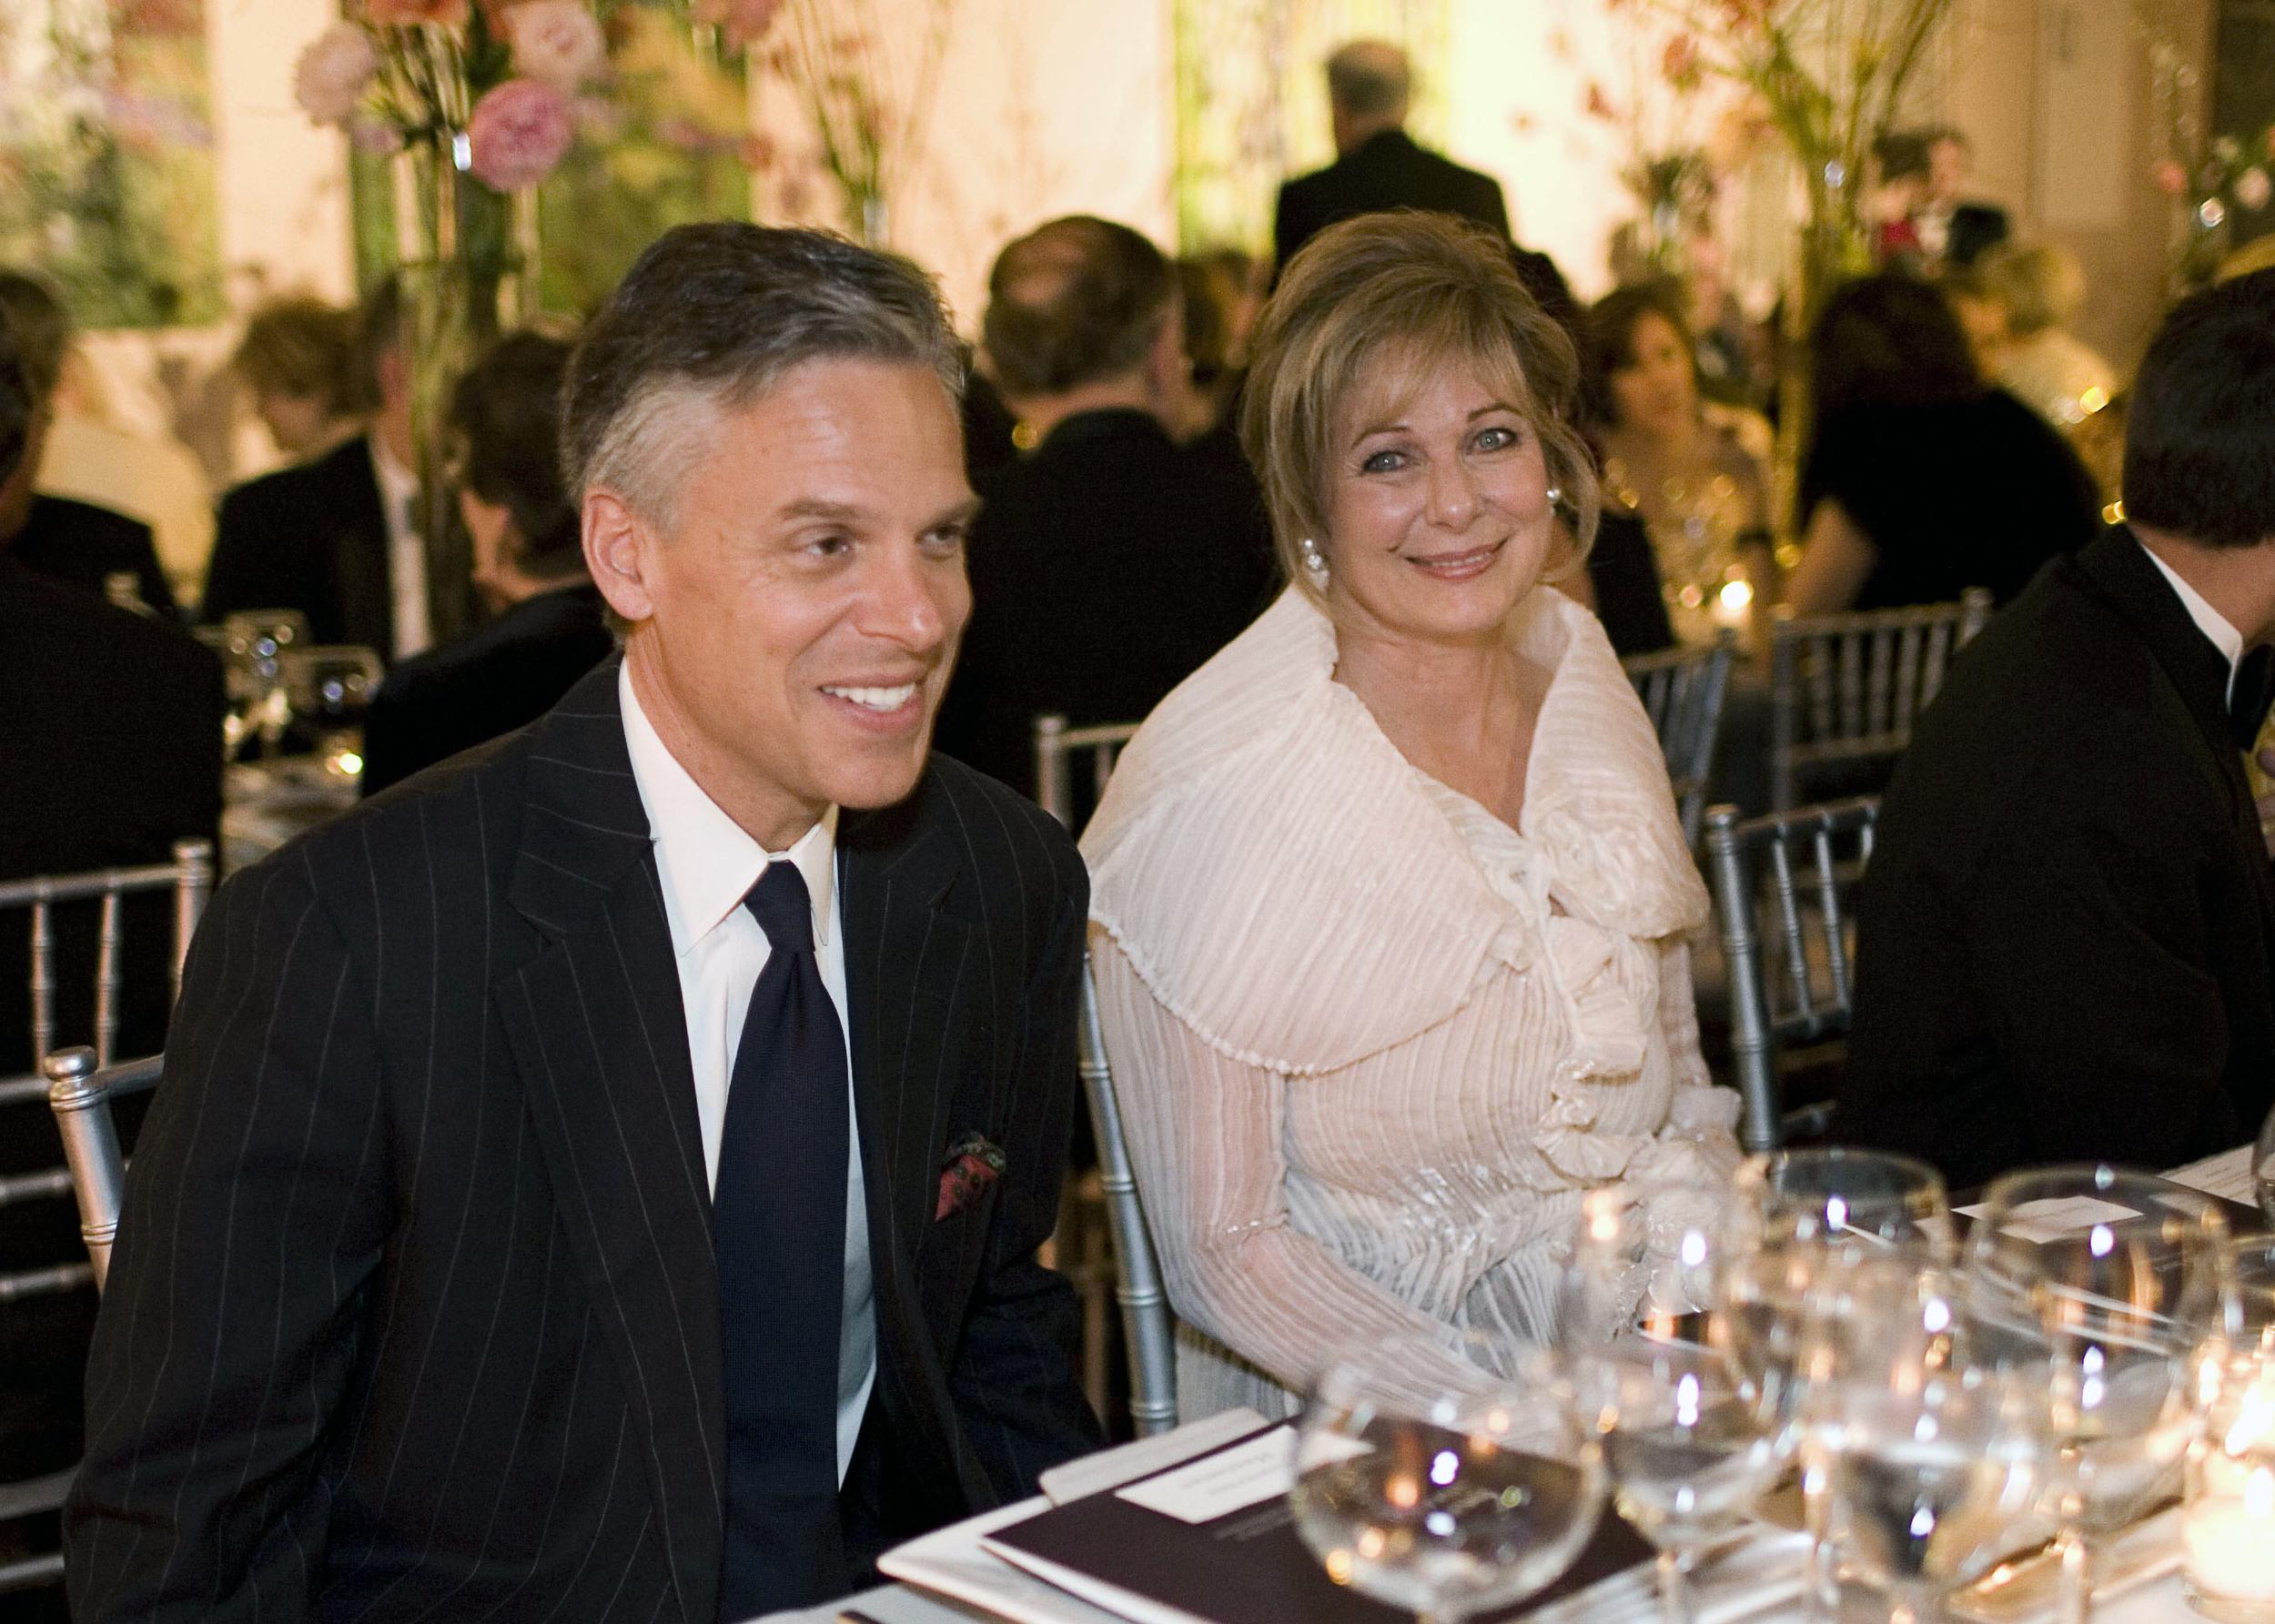 Susan and Gov. Jon Huntsman